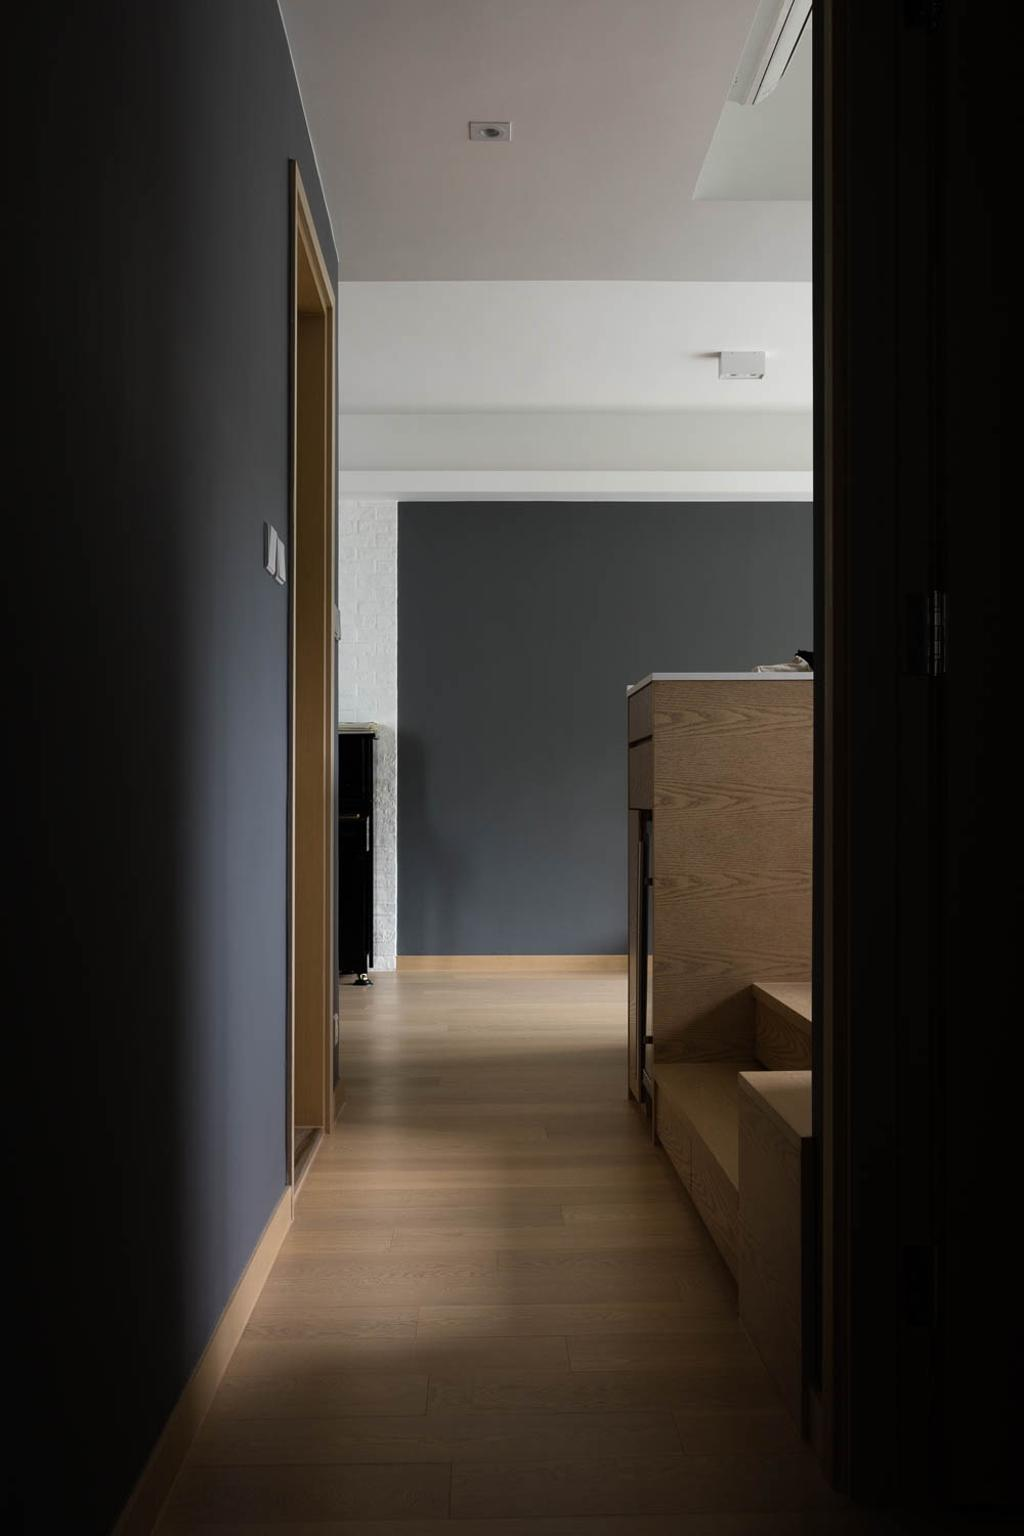 北歐, 私家樓, 玖瓏山, 室內設計師, Fixonic Interior Design & Construction